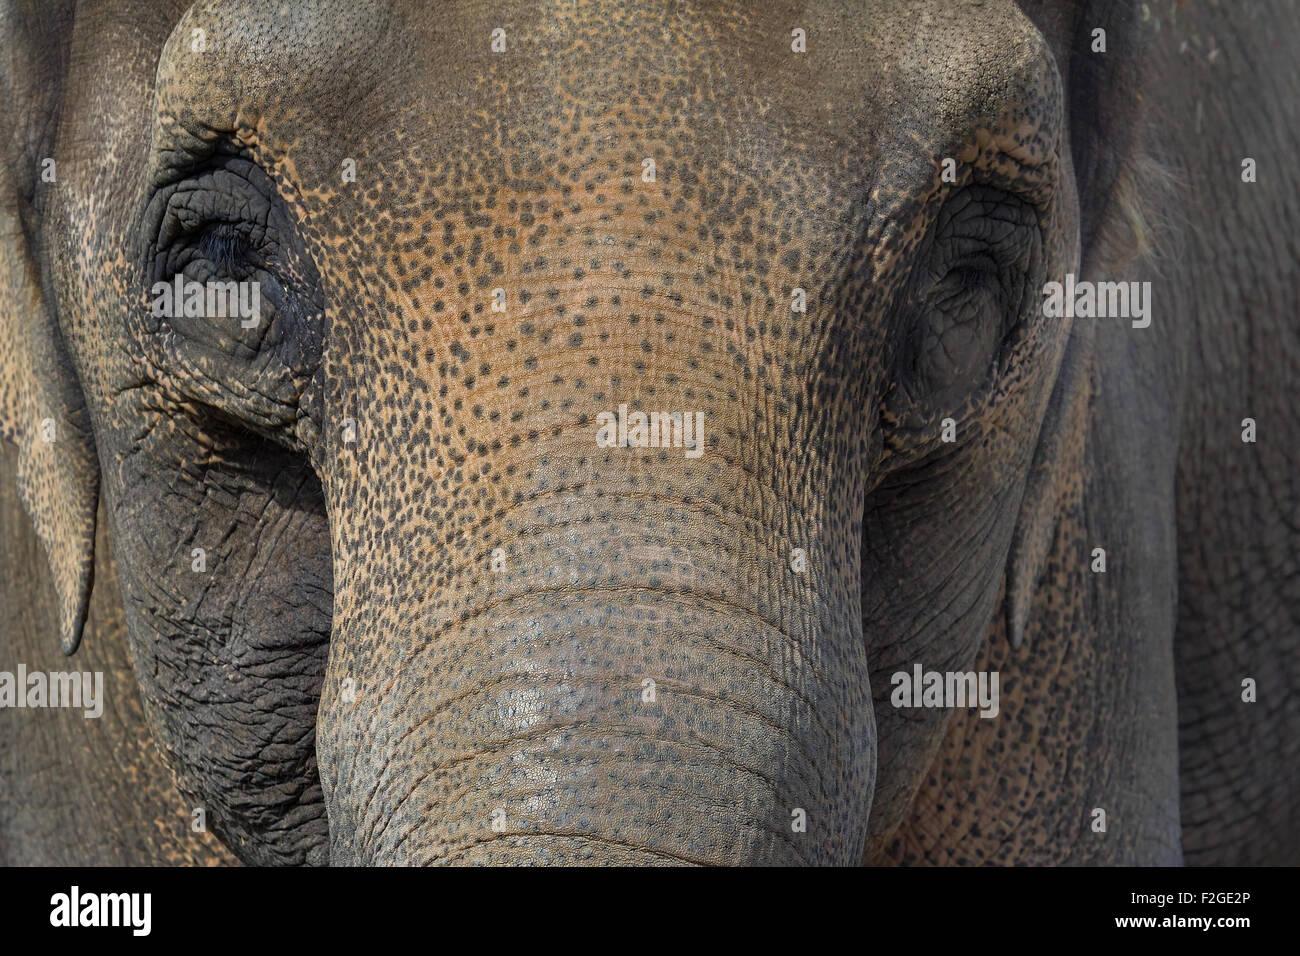 Asian Elephant Closeup Face Portrait Abtract Background - Stock Image